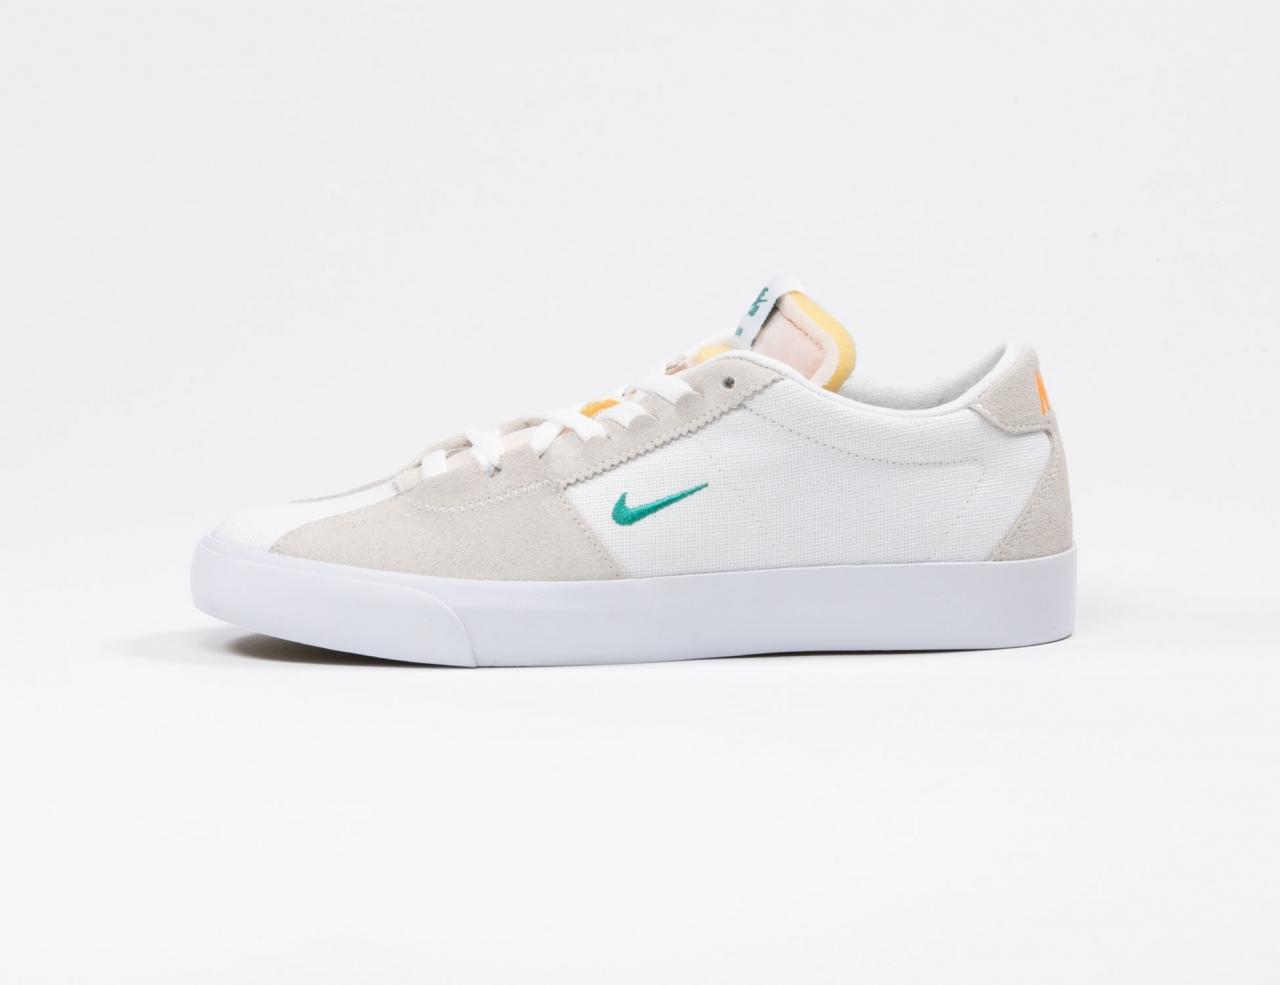 Nike SB Air Zoom Bruin Edge - White/Neptune Green/Vivid Orange